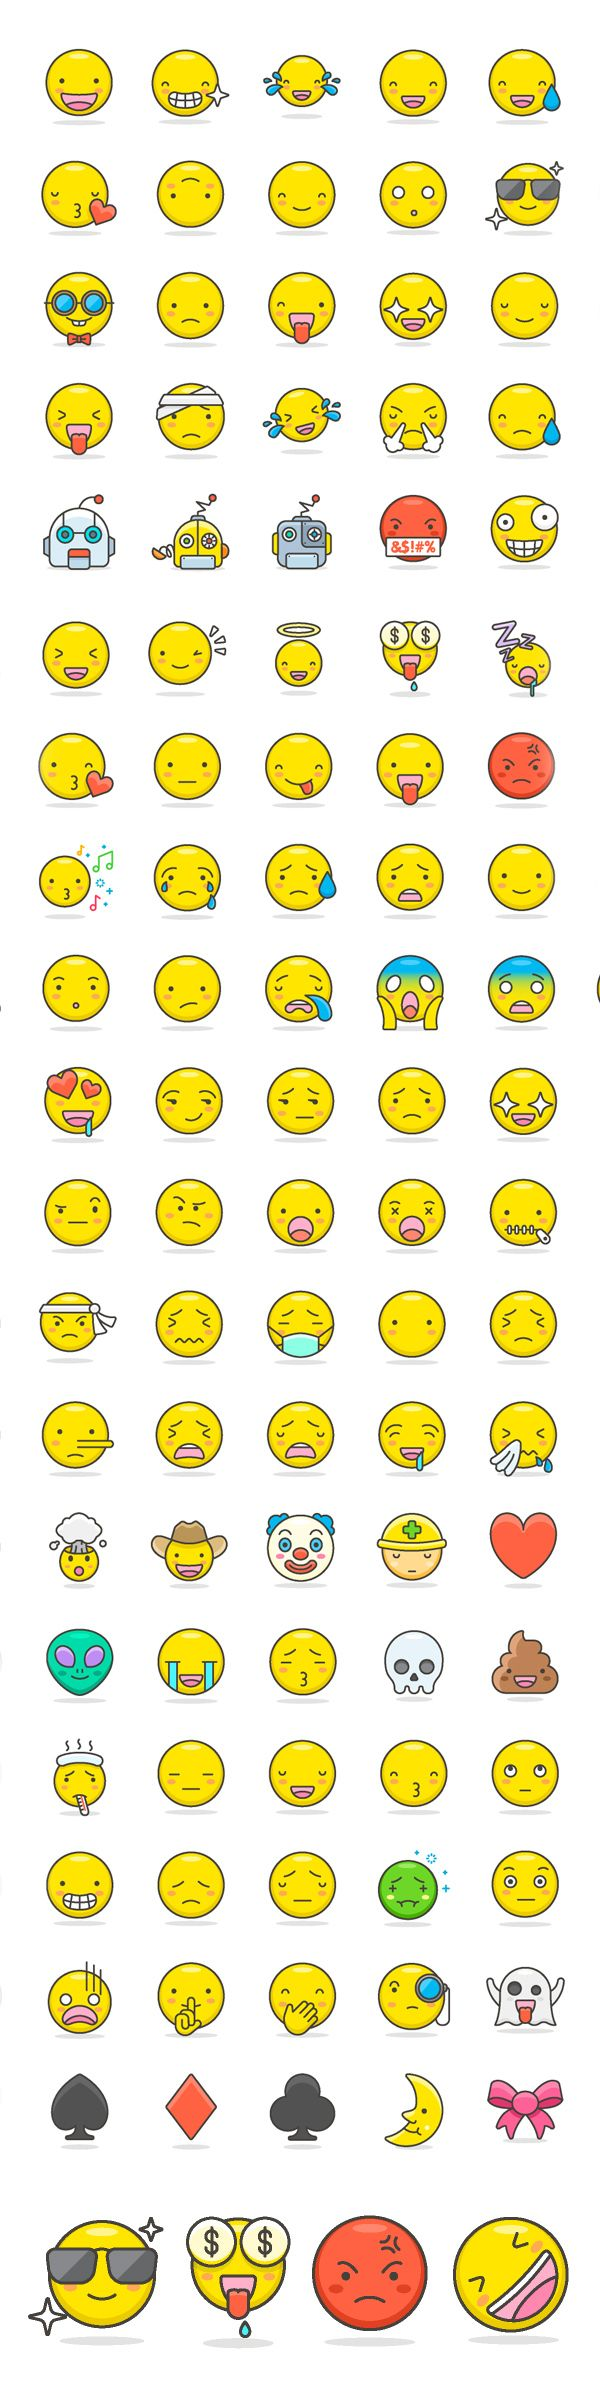 Iconos gratis de Emoji